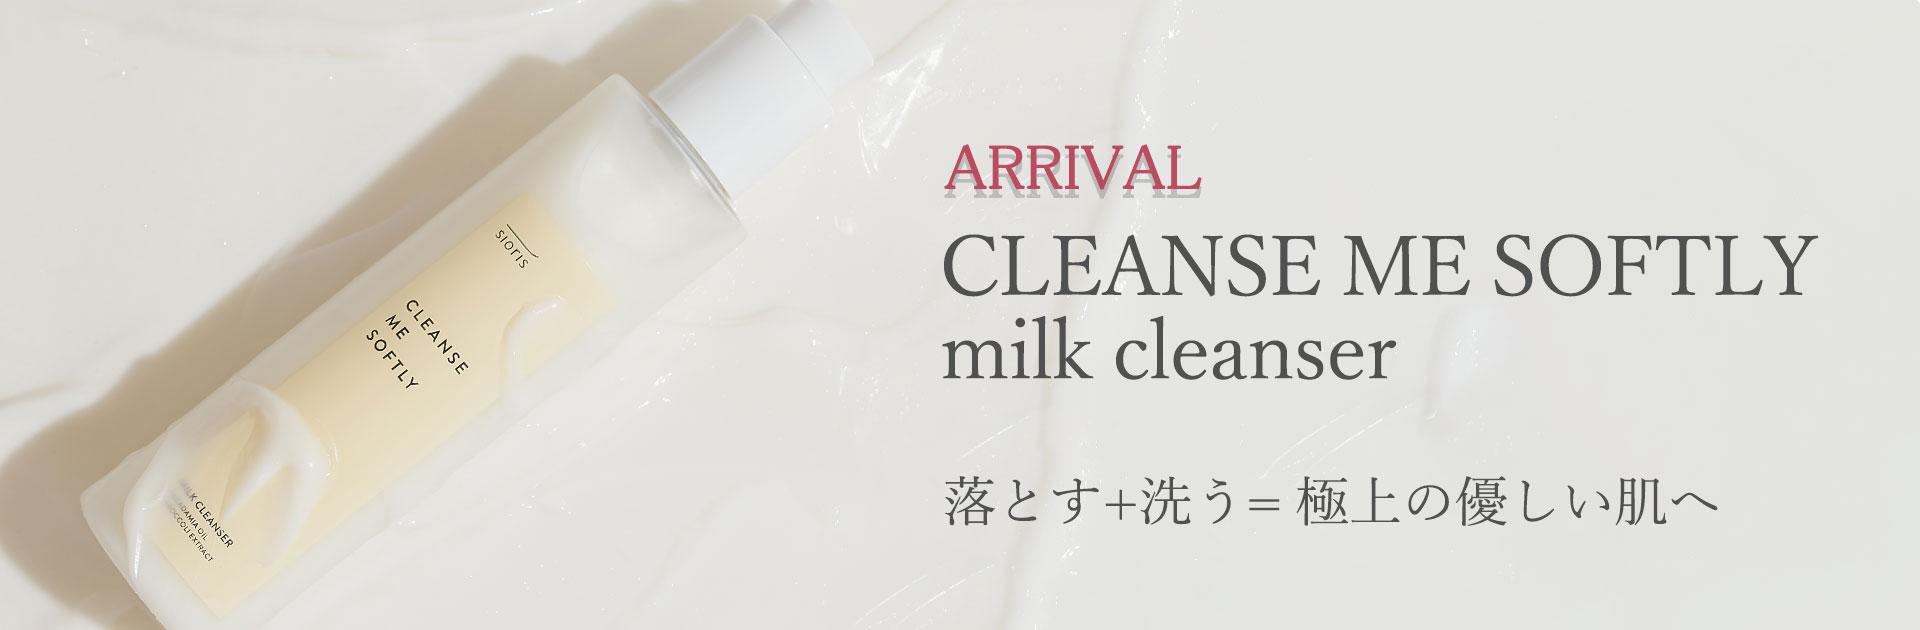 milk-cleanser-バナー.jpg